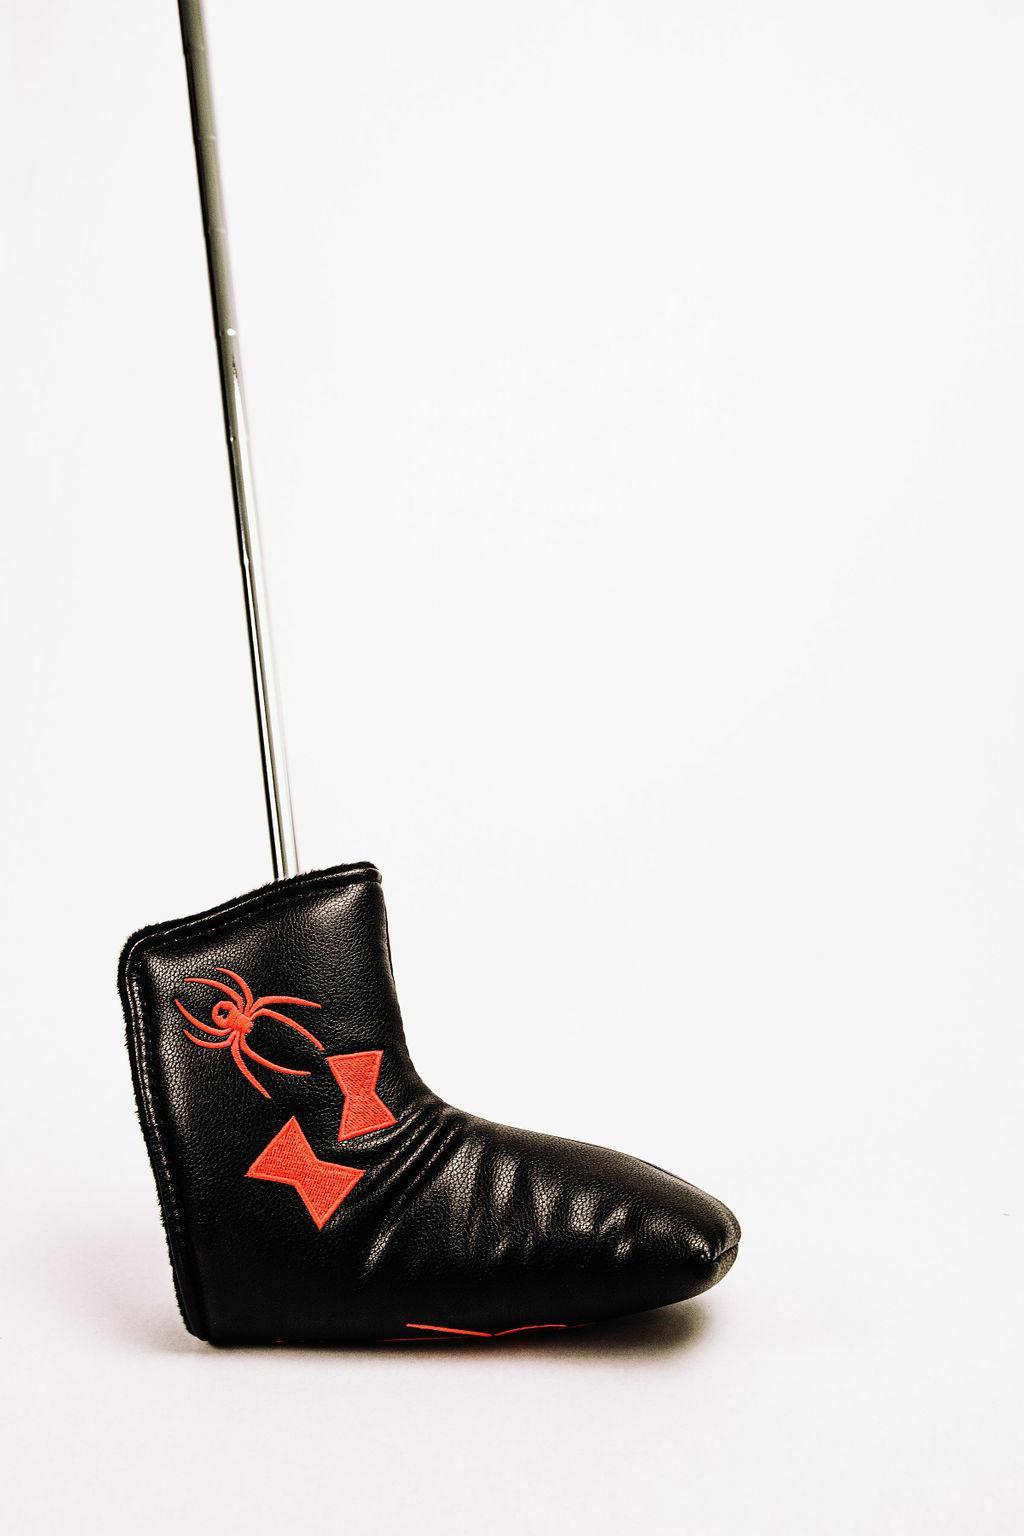 Black Widow Golf